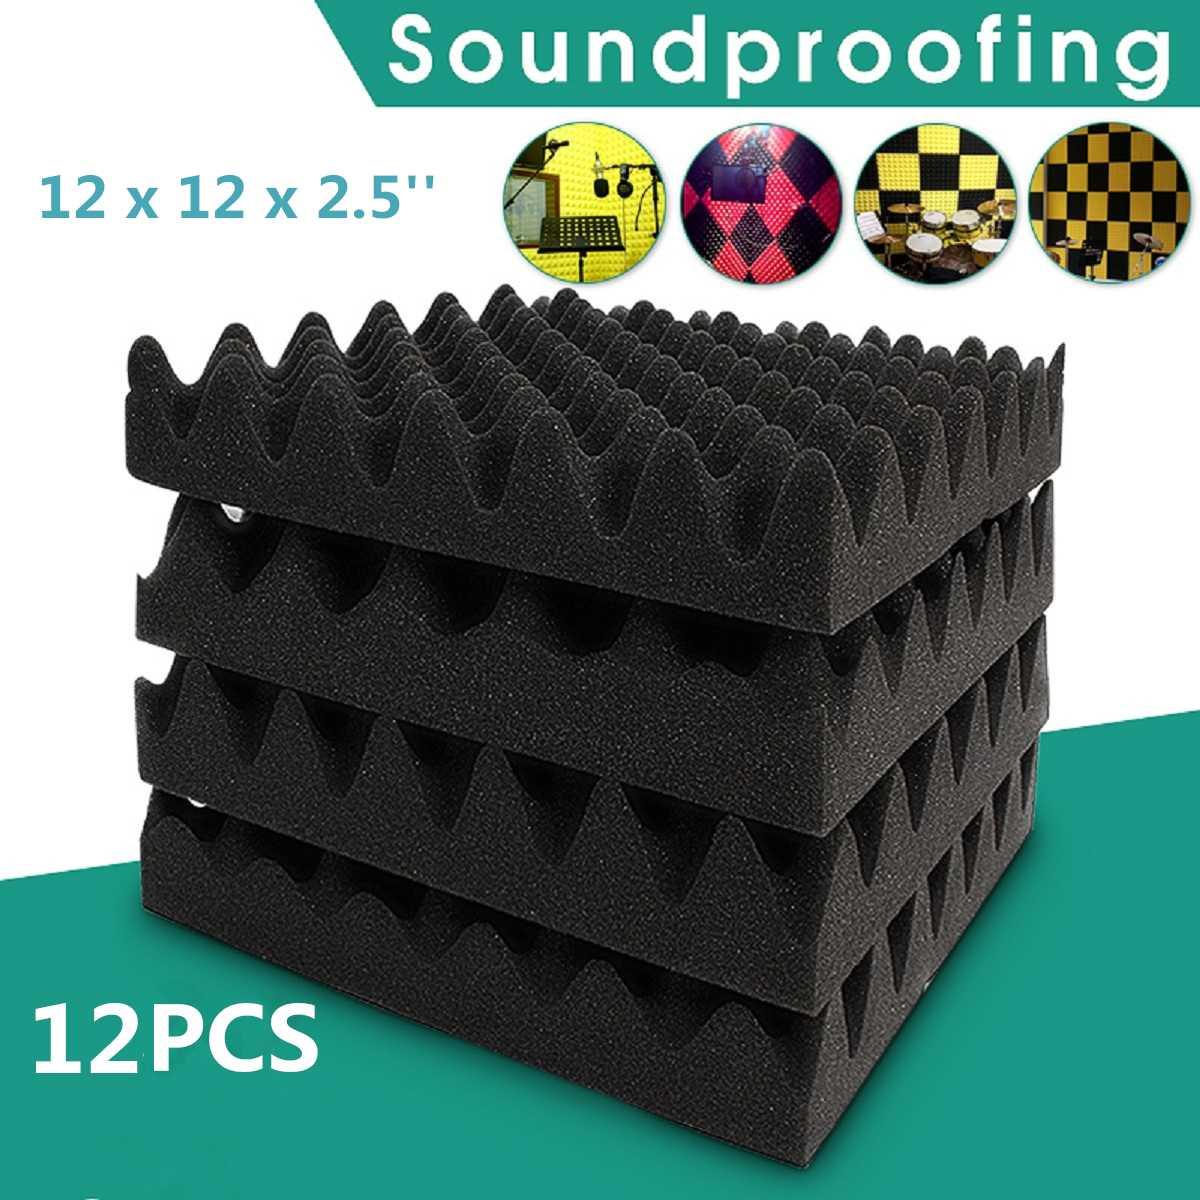 1/6/12 PCS 30 X 30 X 6cm Soundproofing Foam Acoustic Foam Sound Treatment Studio Room Absorption Wedge Tiles Polyurethane Foam